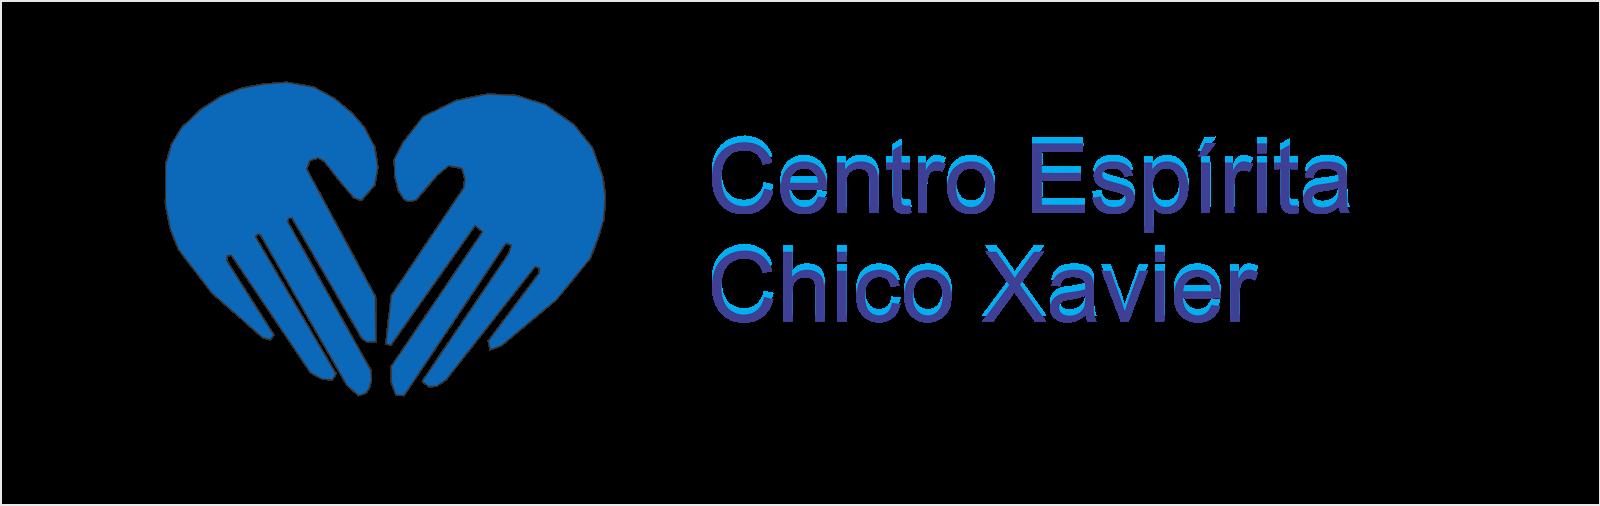 Centro Espírita Chico Xavier